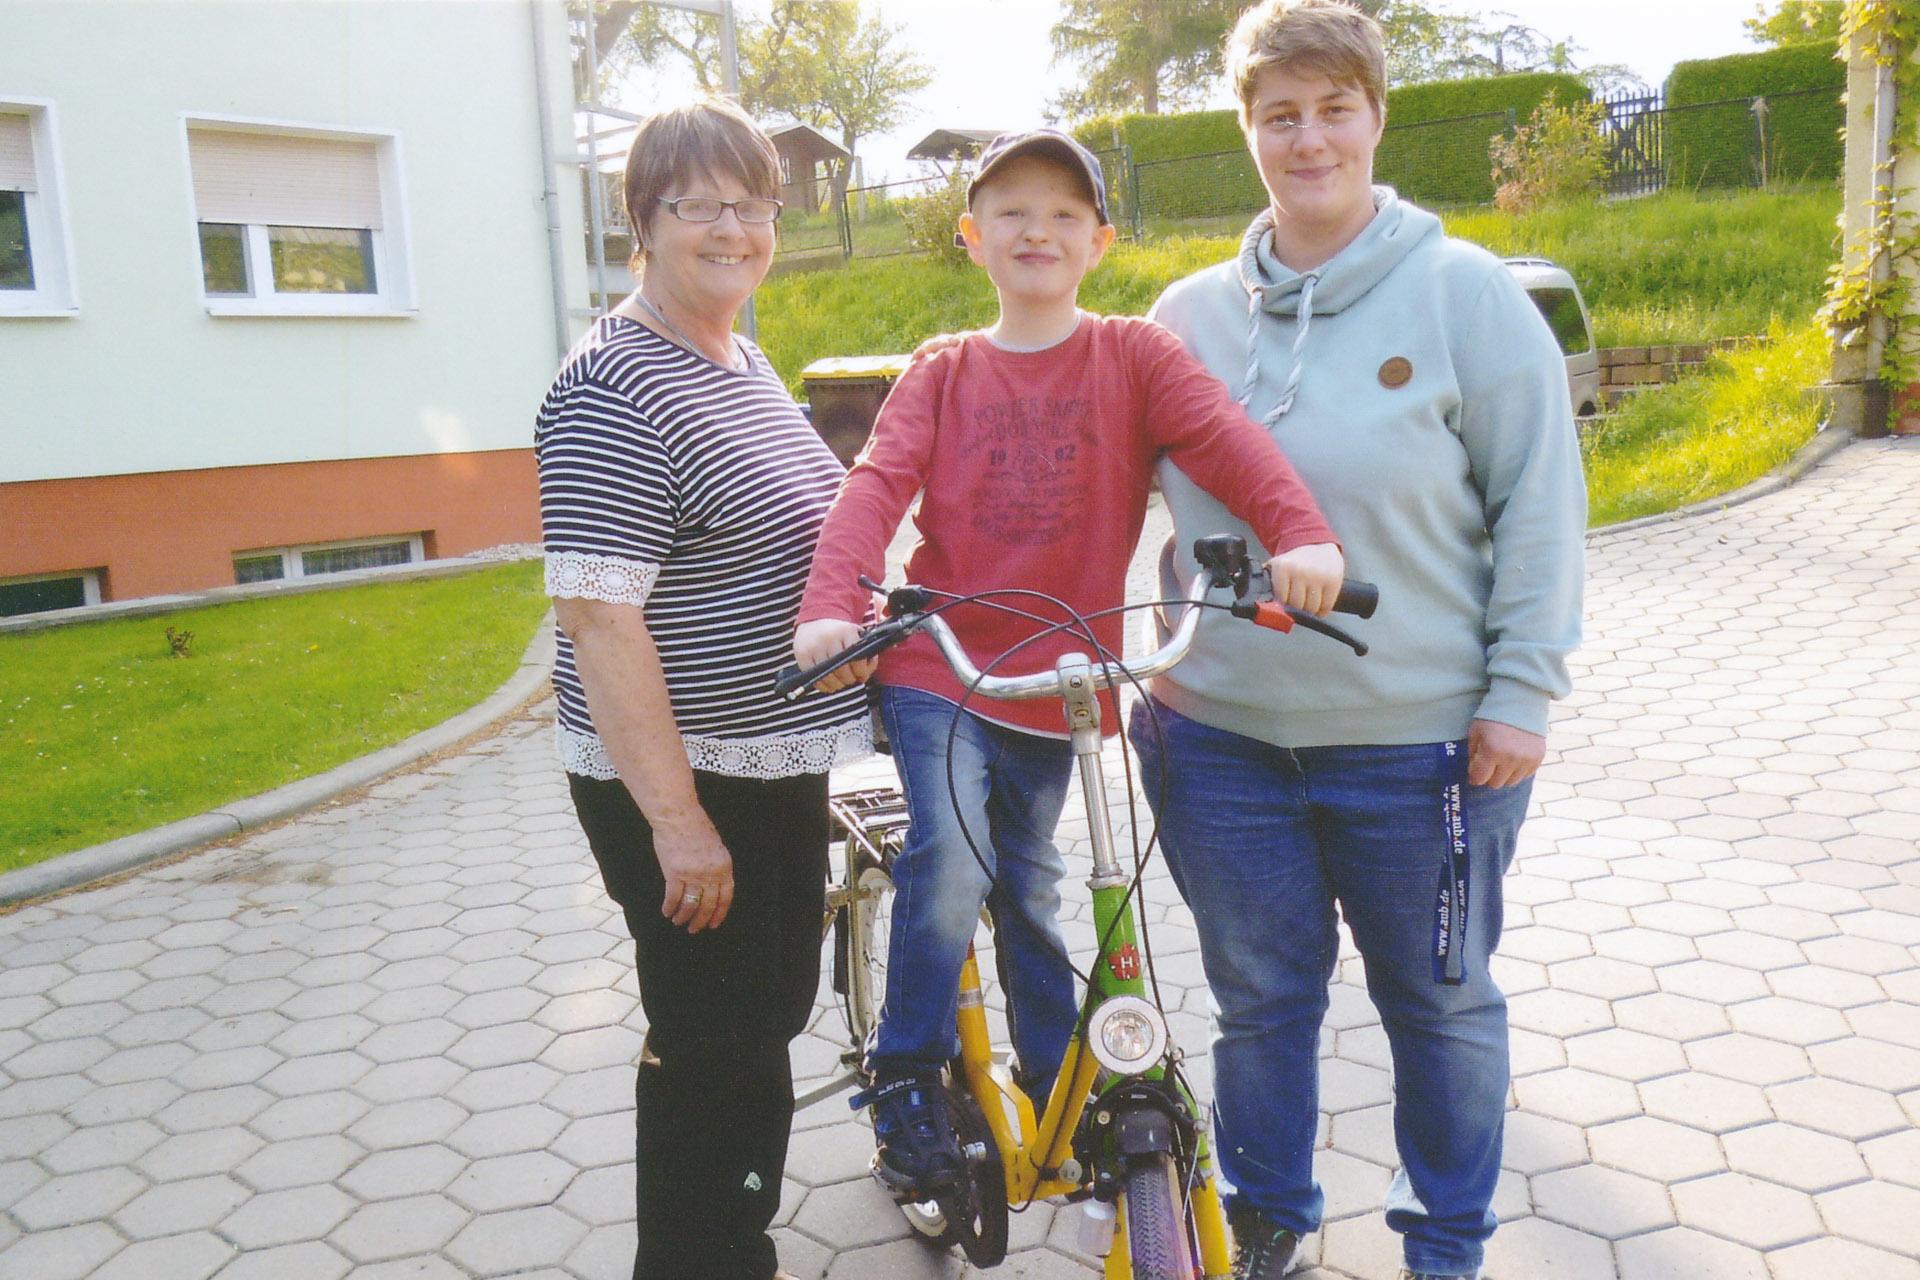 Diakonieverein Carolinenfeld: Chris-Leon freut sich über eigenes Fahrrad